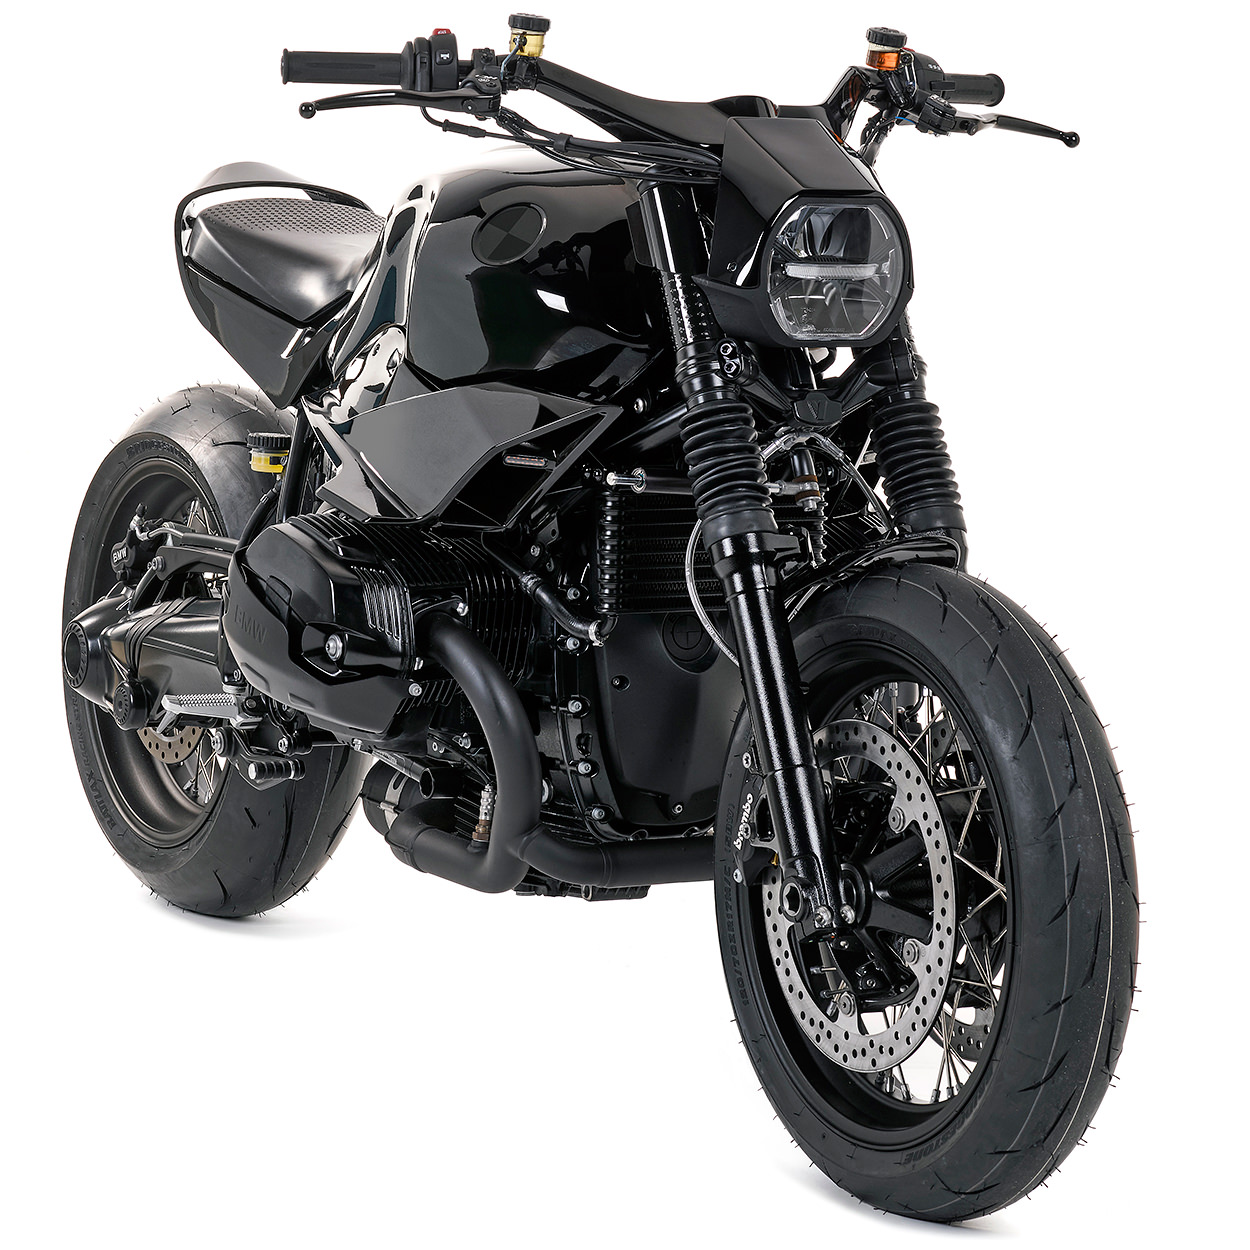 BMW R nineT body kit by Viba